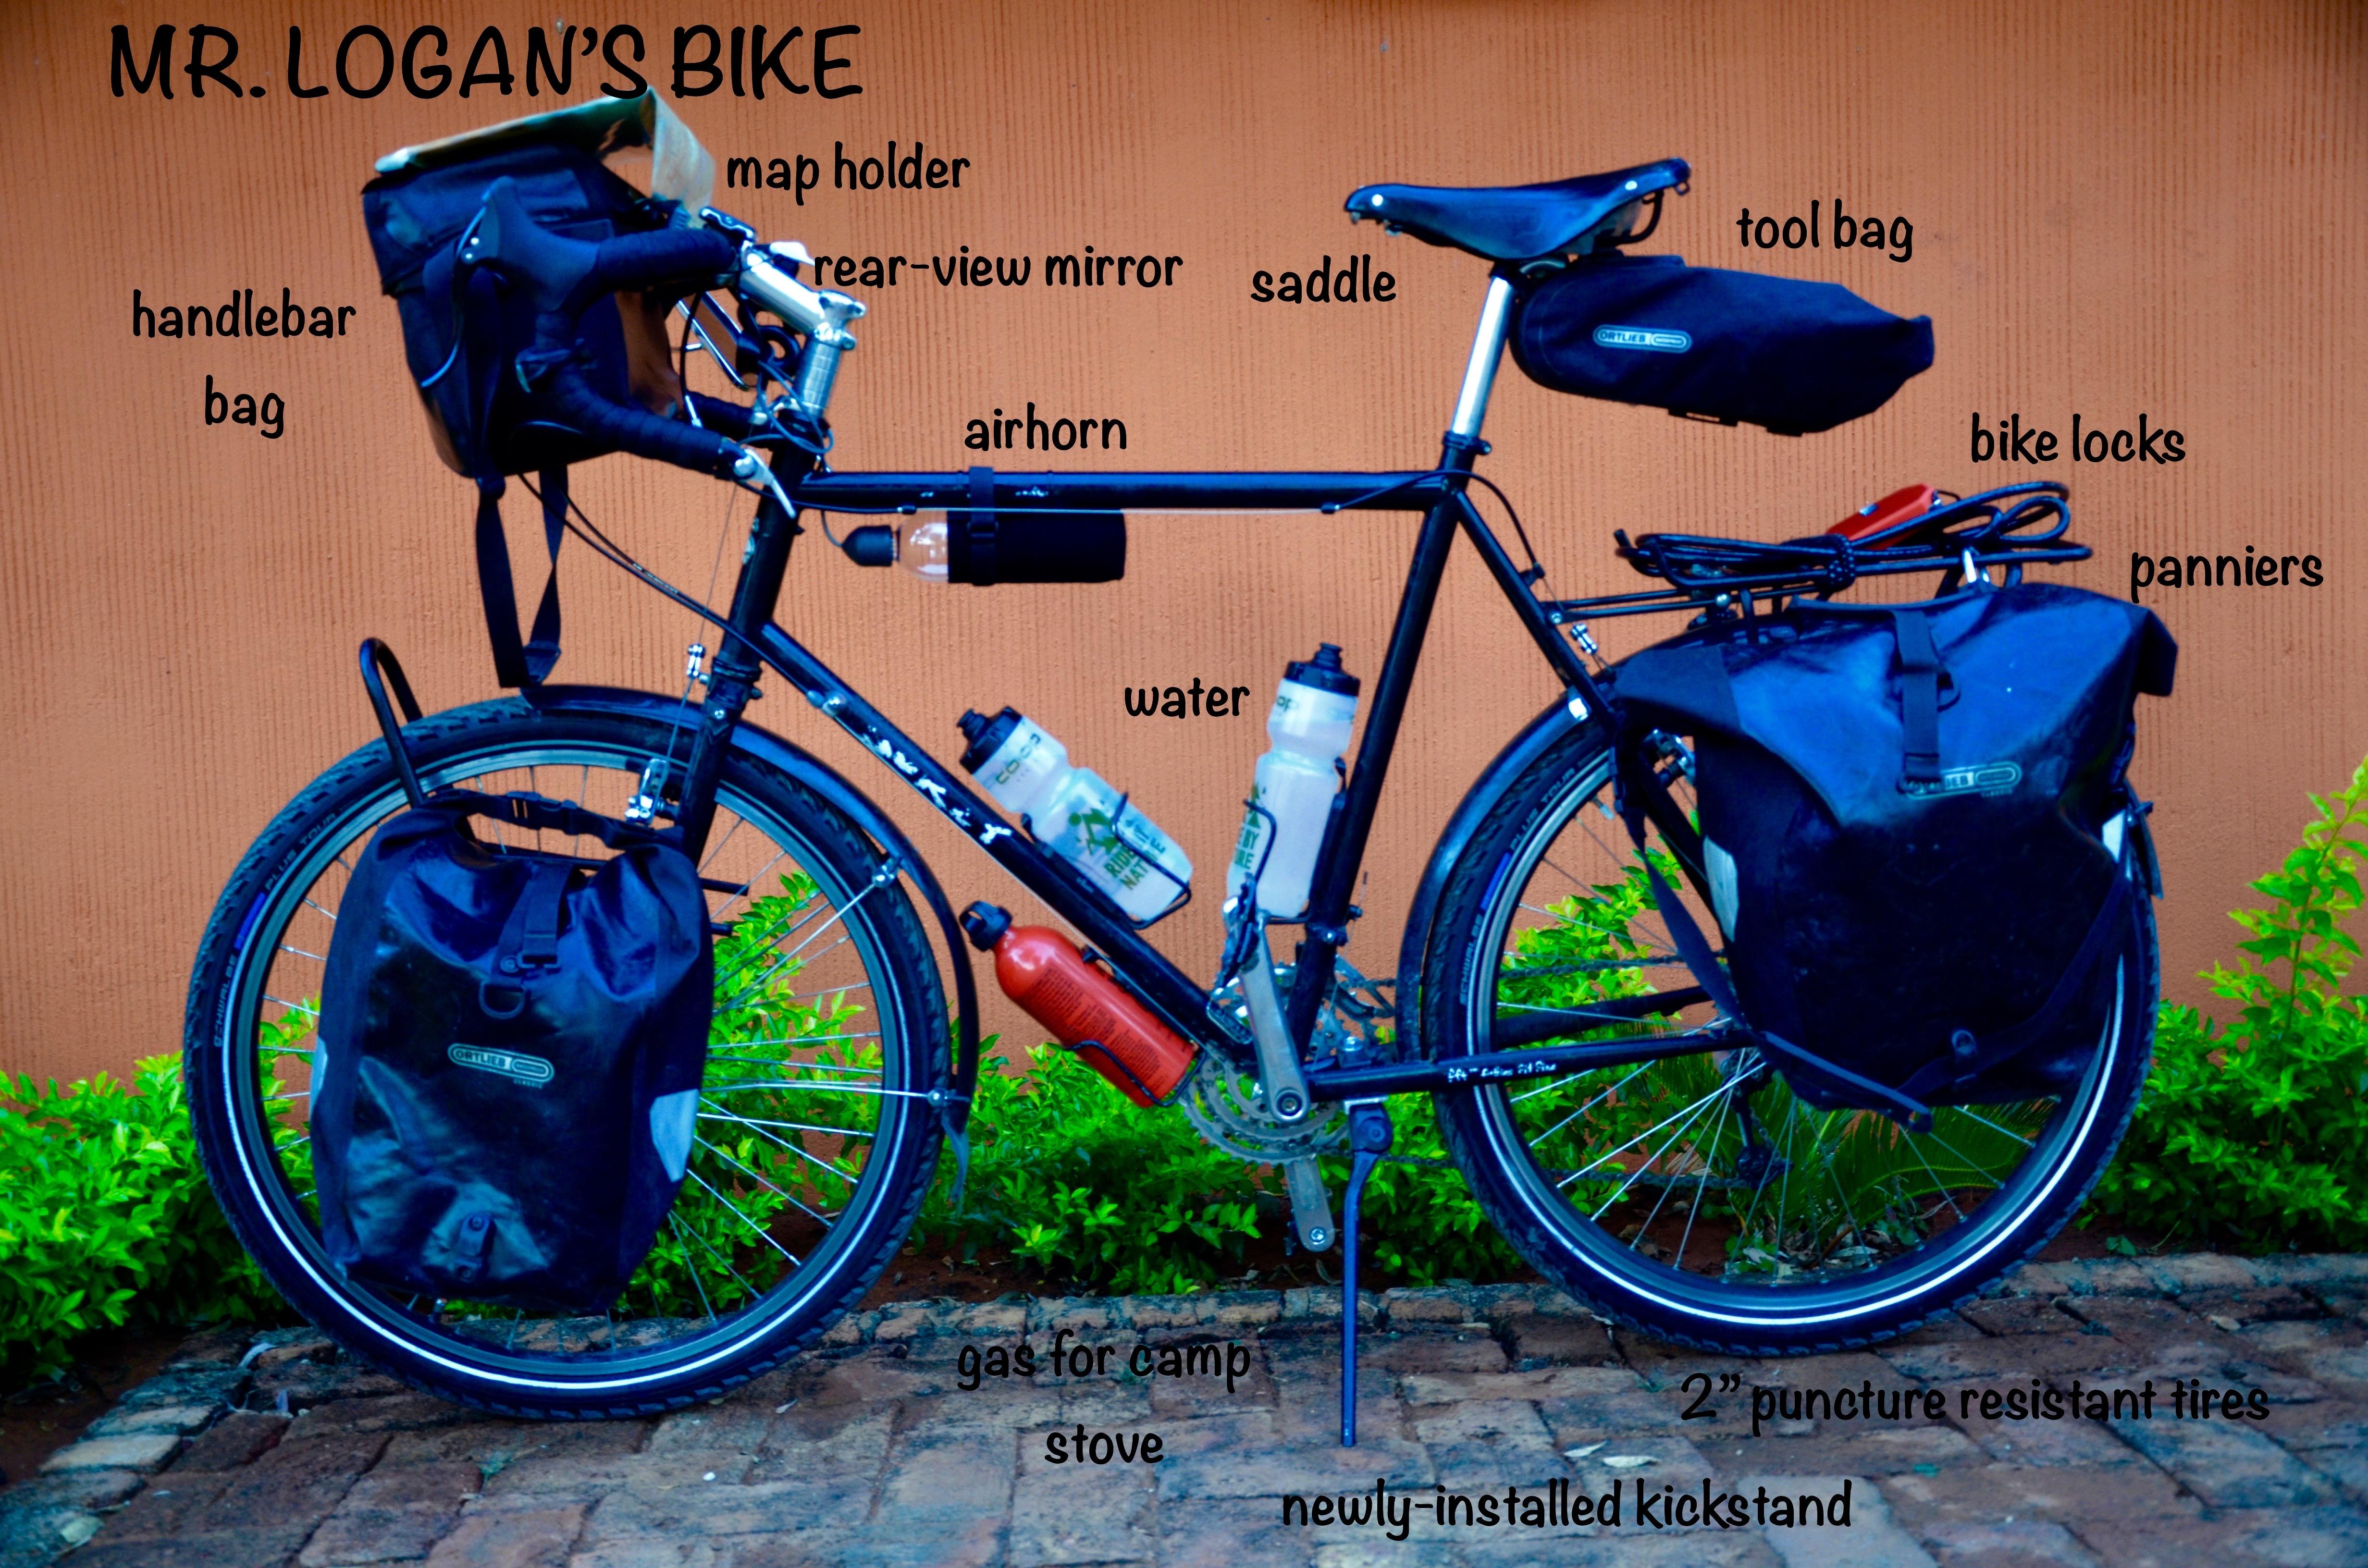 Gearing Up For Africa Logans Biking Adventures